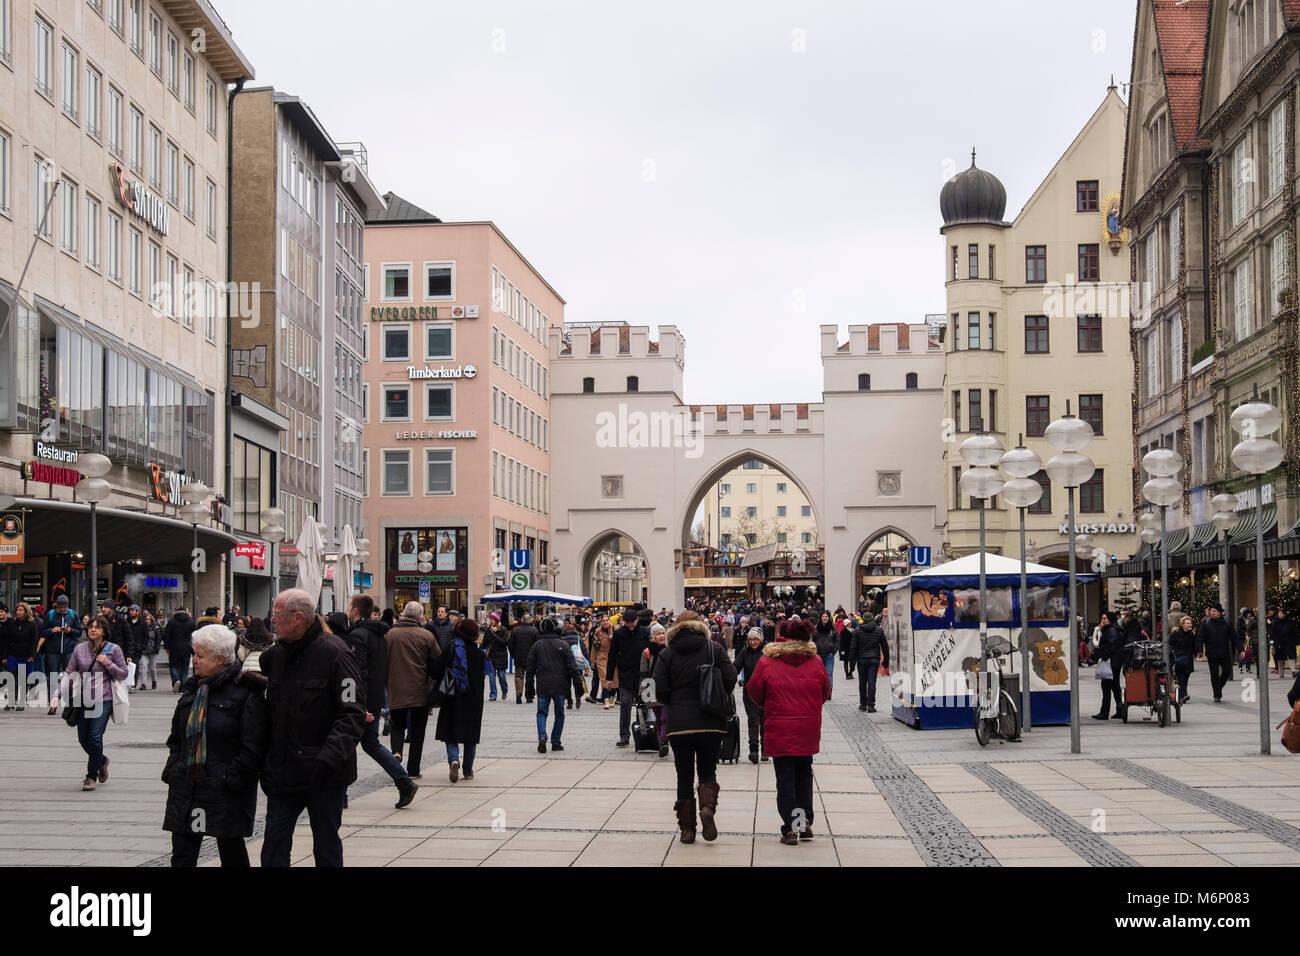 Busy street scene on pedestrianised shopping precinct in old town city centre at Karlstor gate on Neuhauser Strasse, - Stock Image